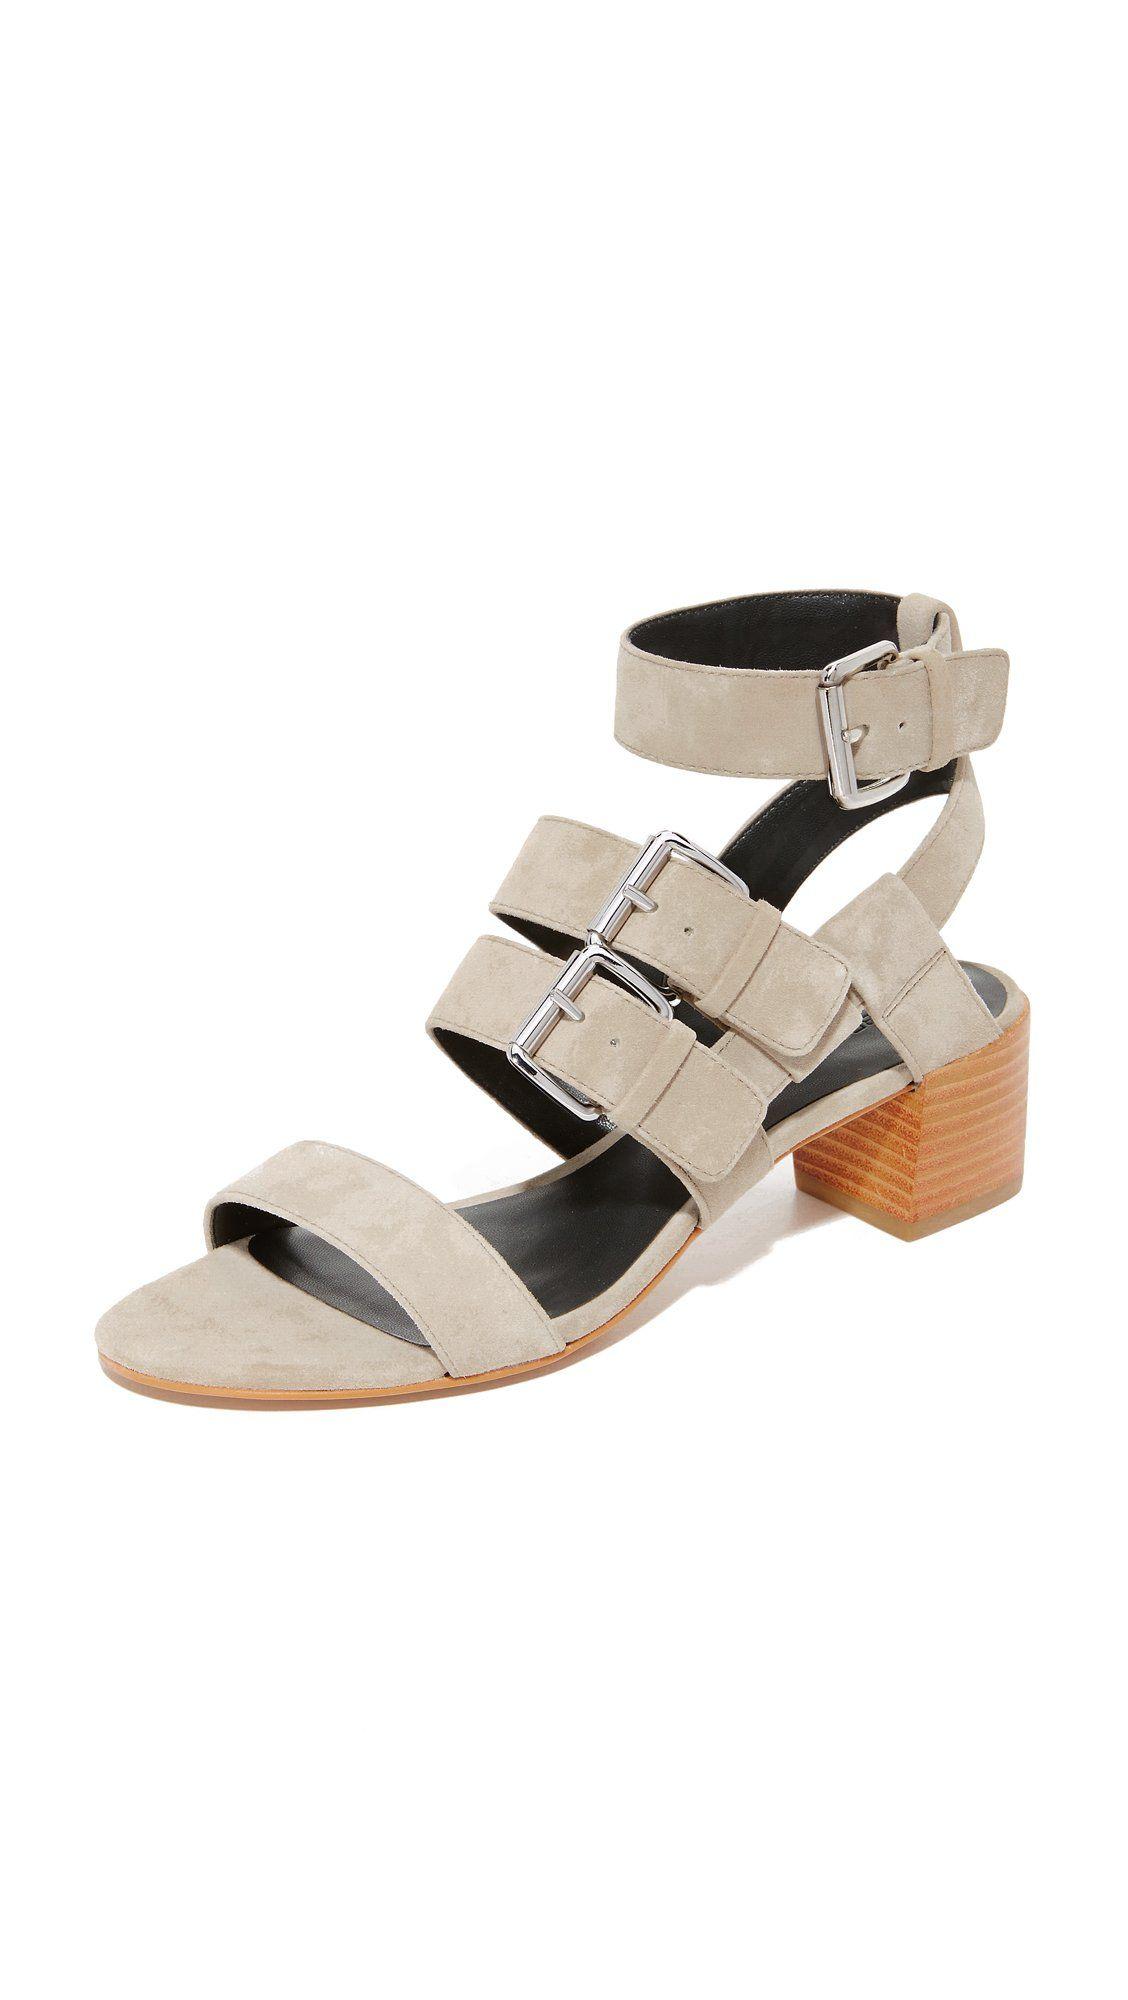 Rebecca Minkoff Women's Ilana City Sandals, Slate, 5.5 B(M) US. Kidskin.